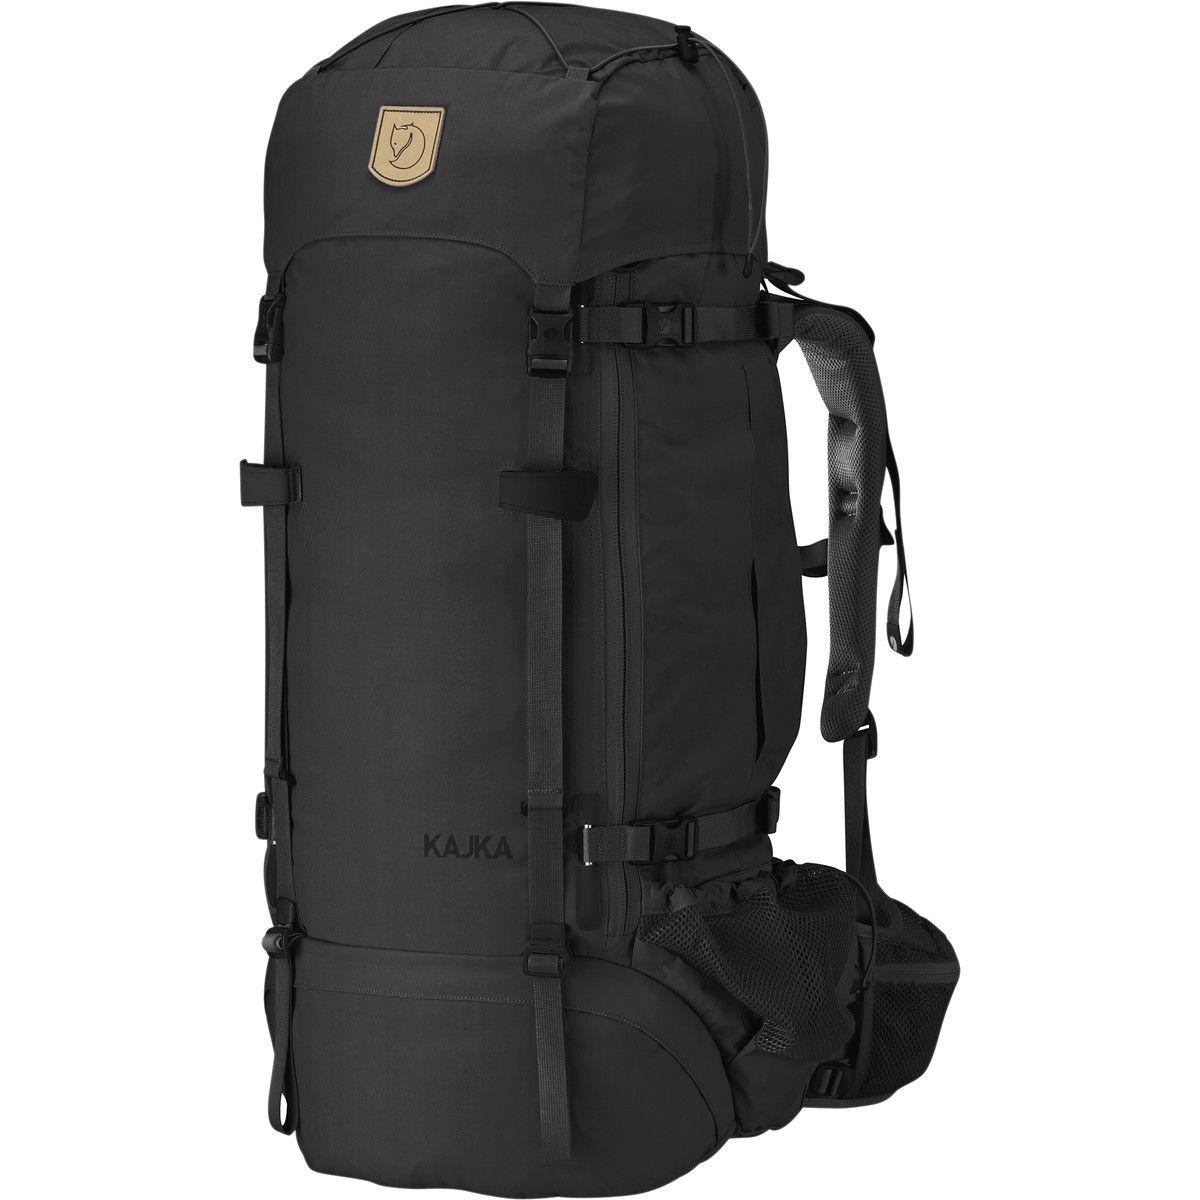 Photo of Fjallraven Kajka 65L Backpack